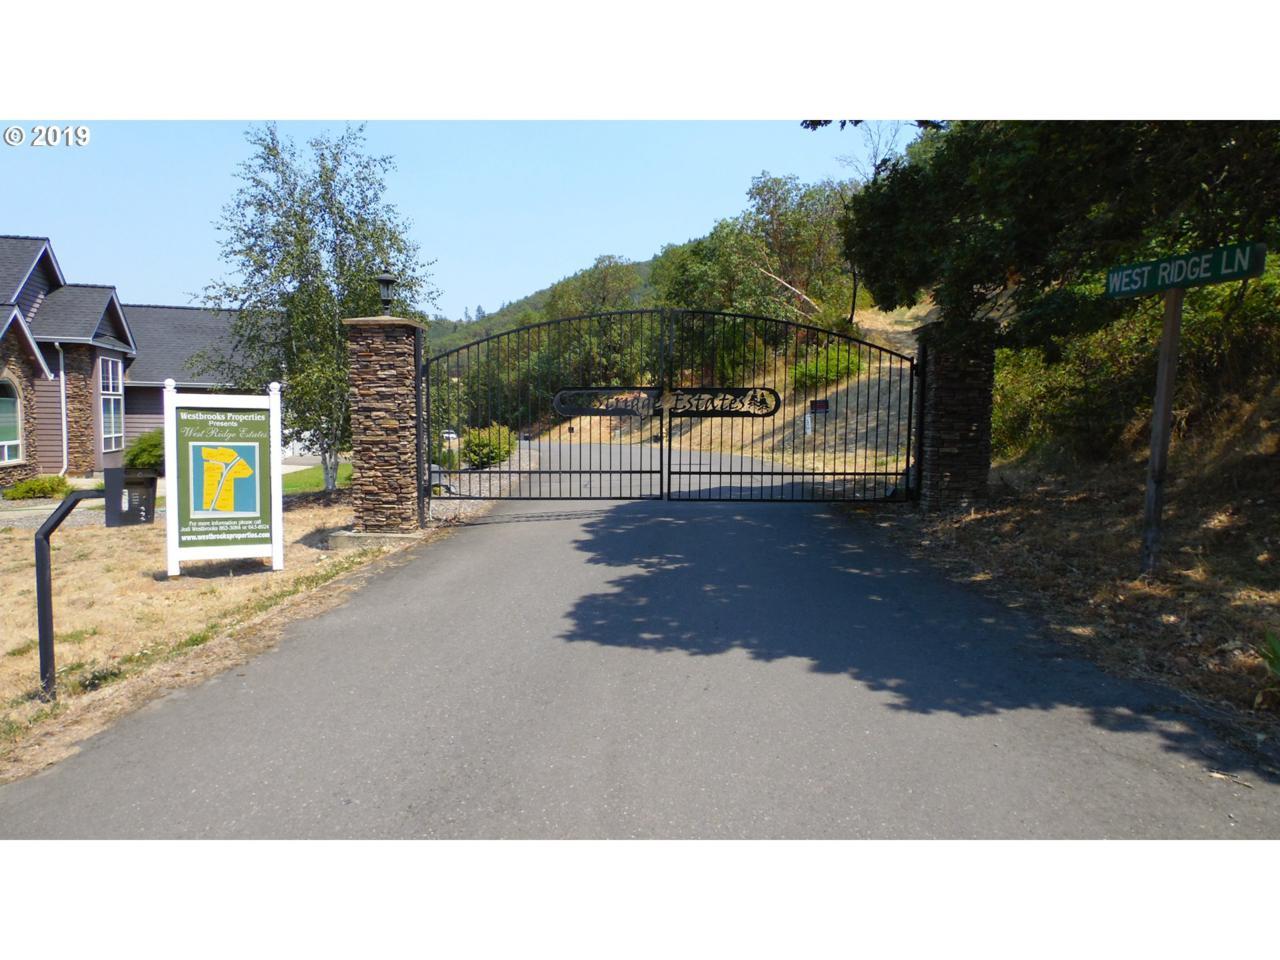 163 West Ridge Ln - Photo 1